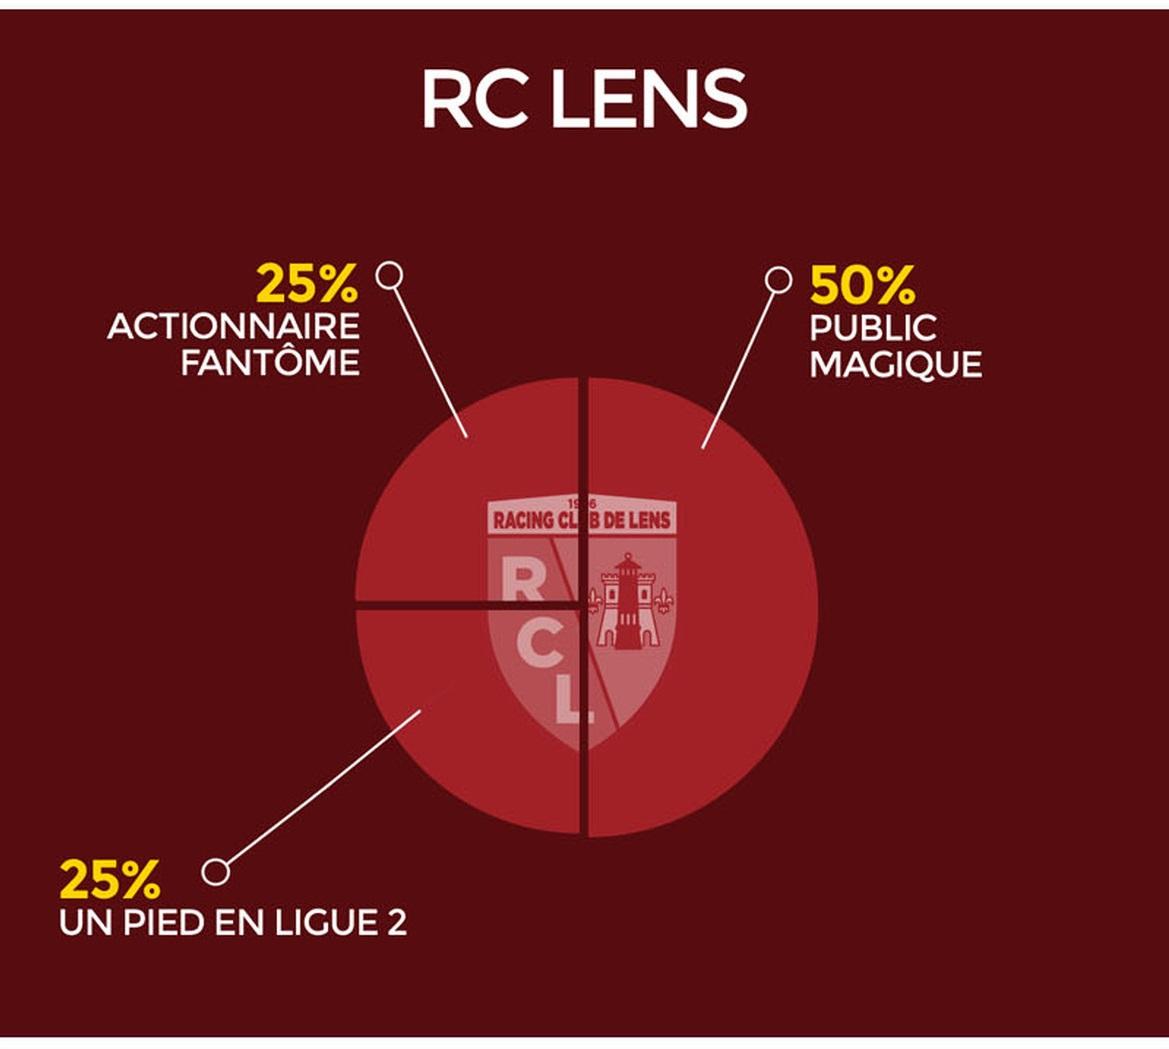 rclens